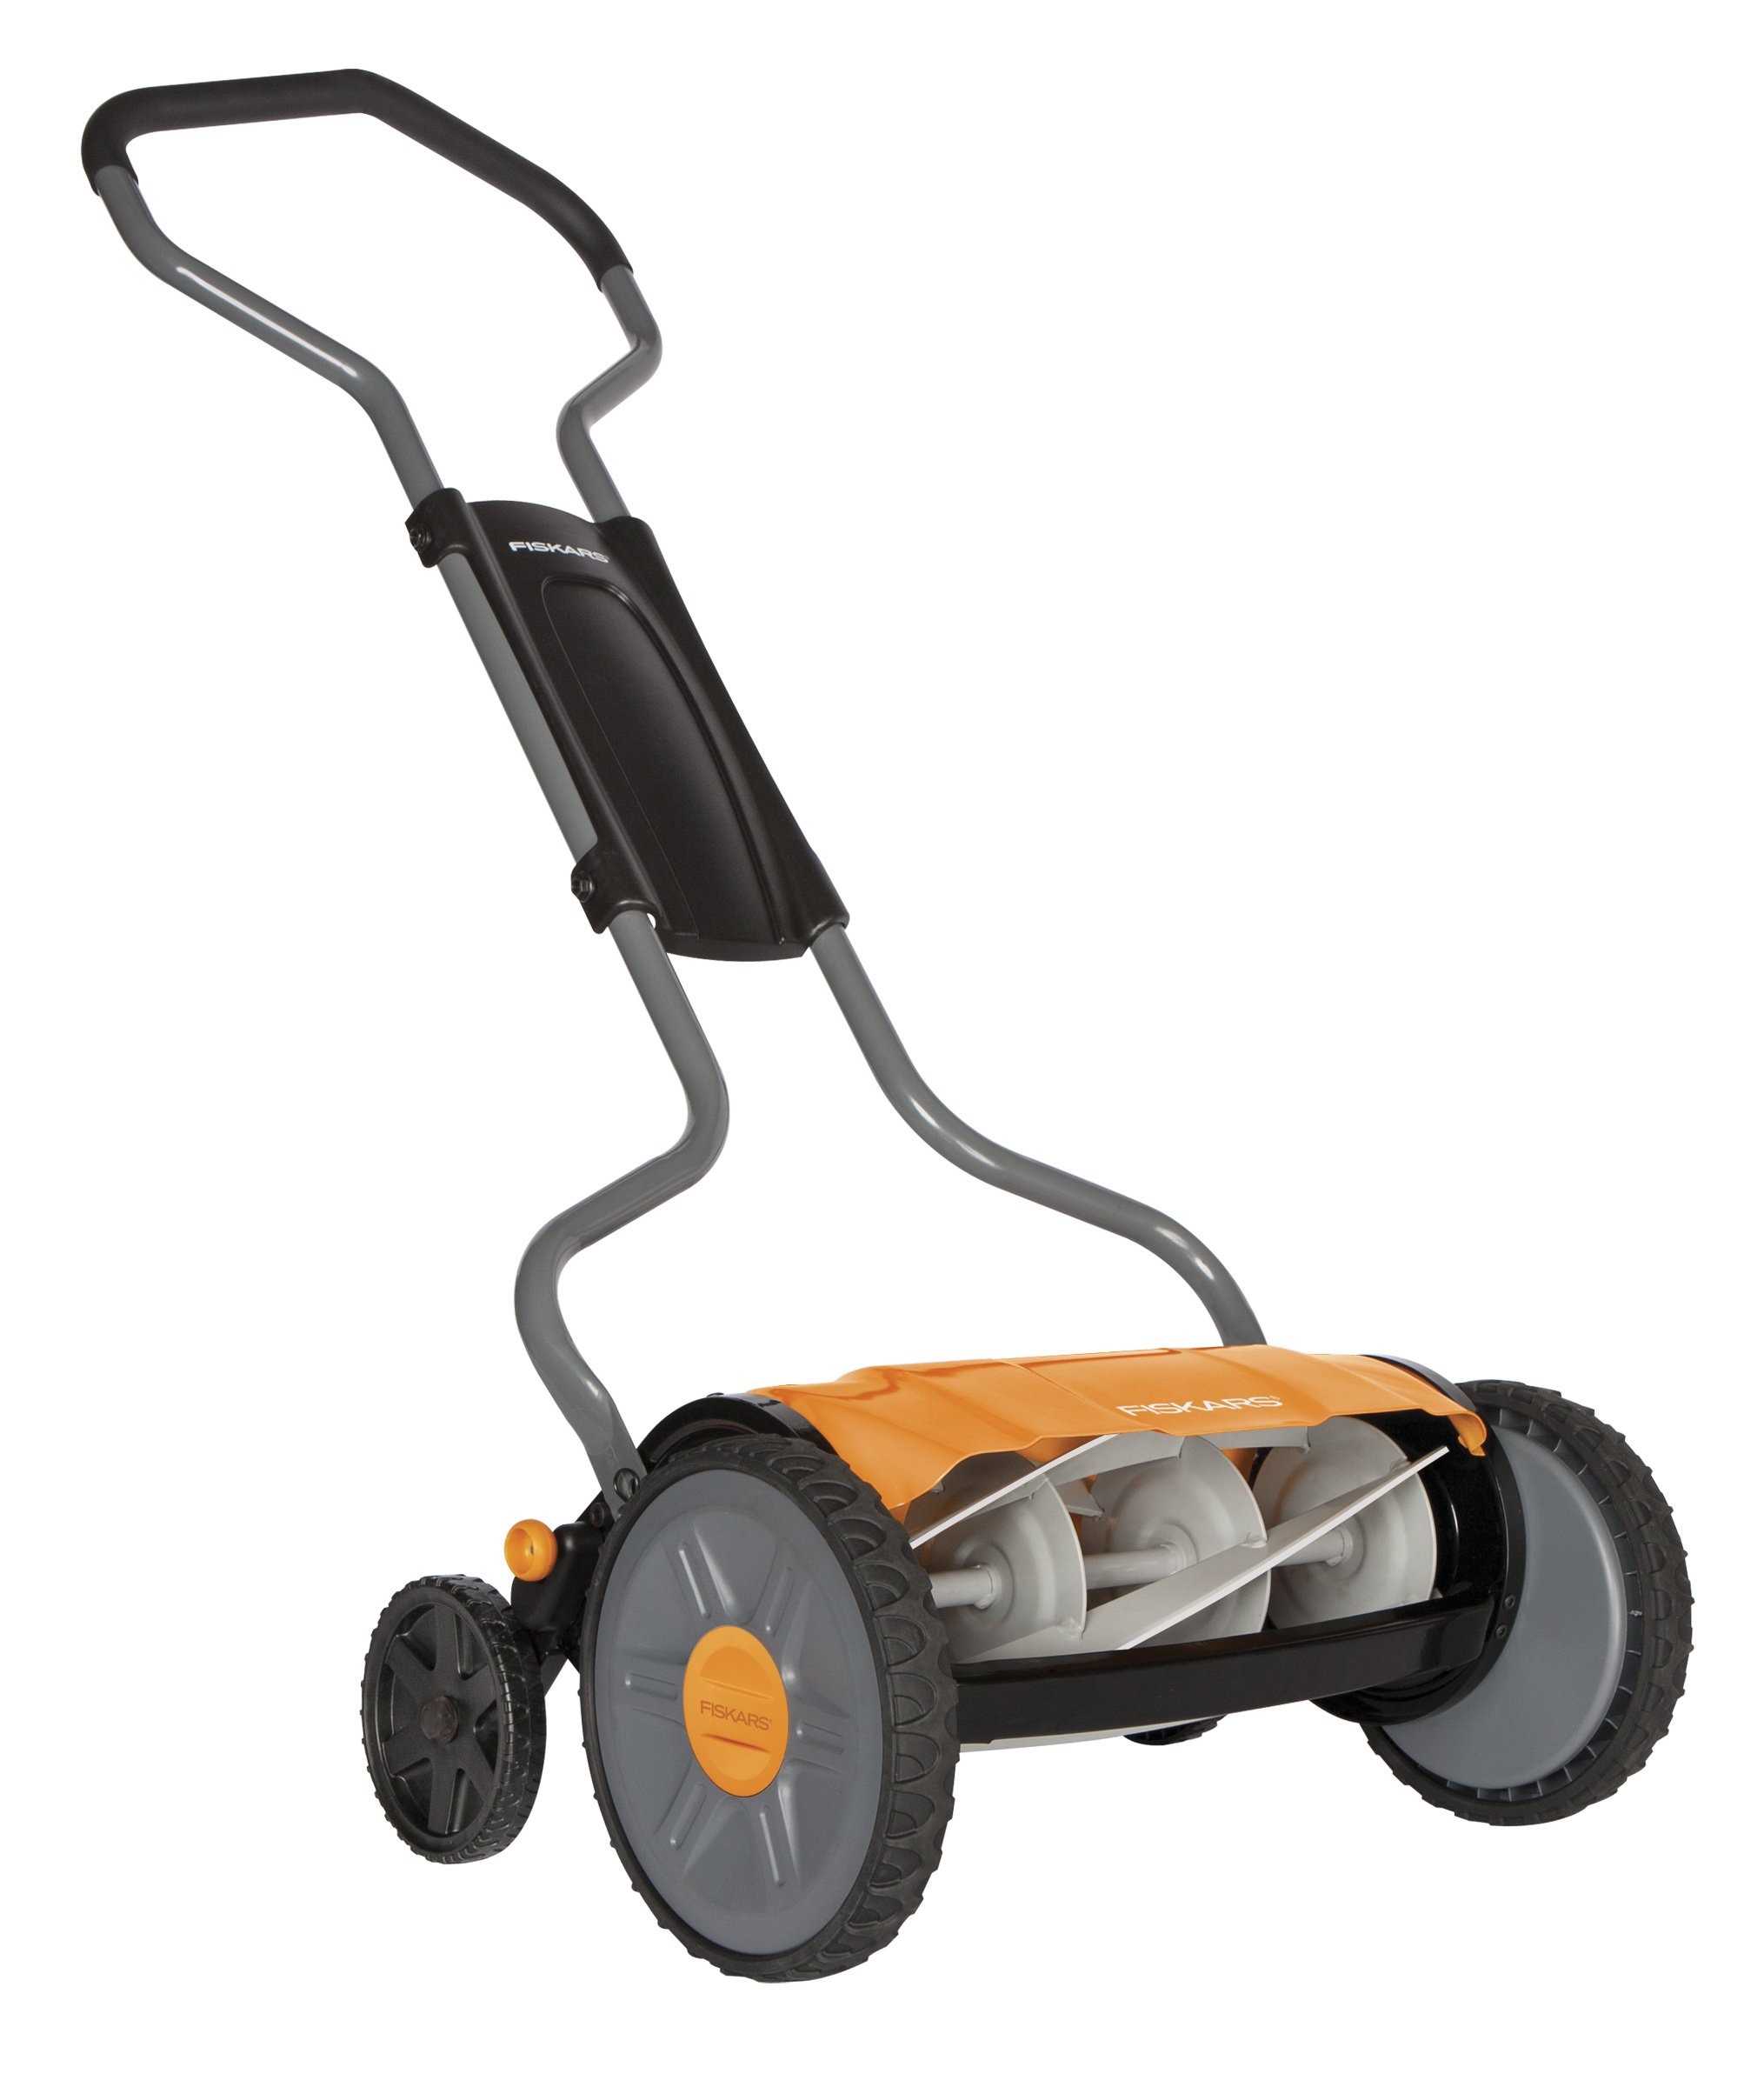 Fiskars 17 Inch StaySharp Plus Reel Mower (6207)